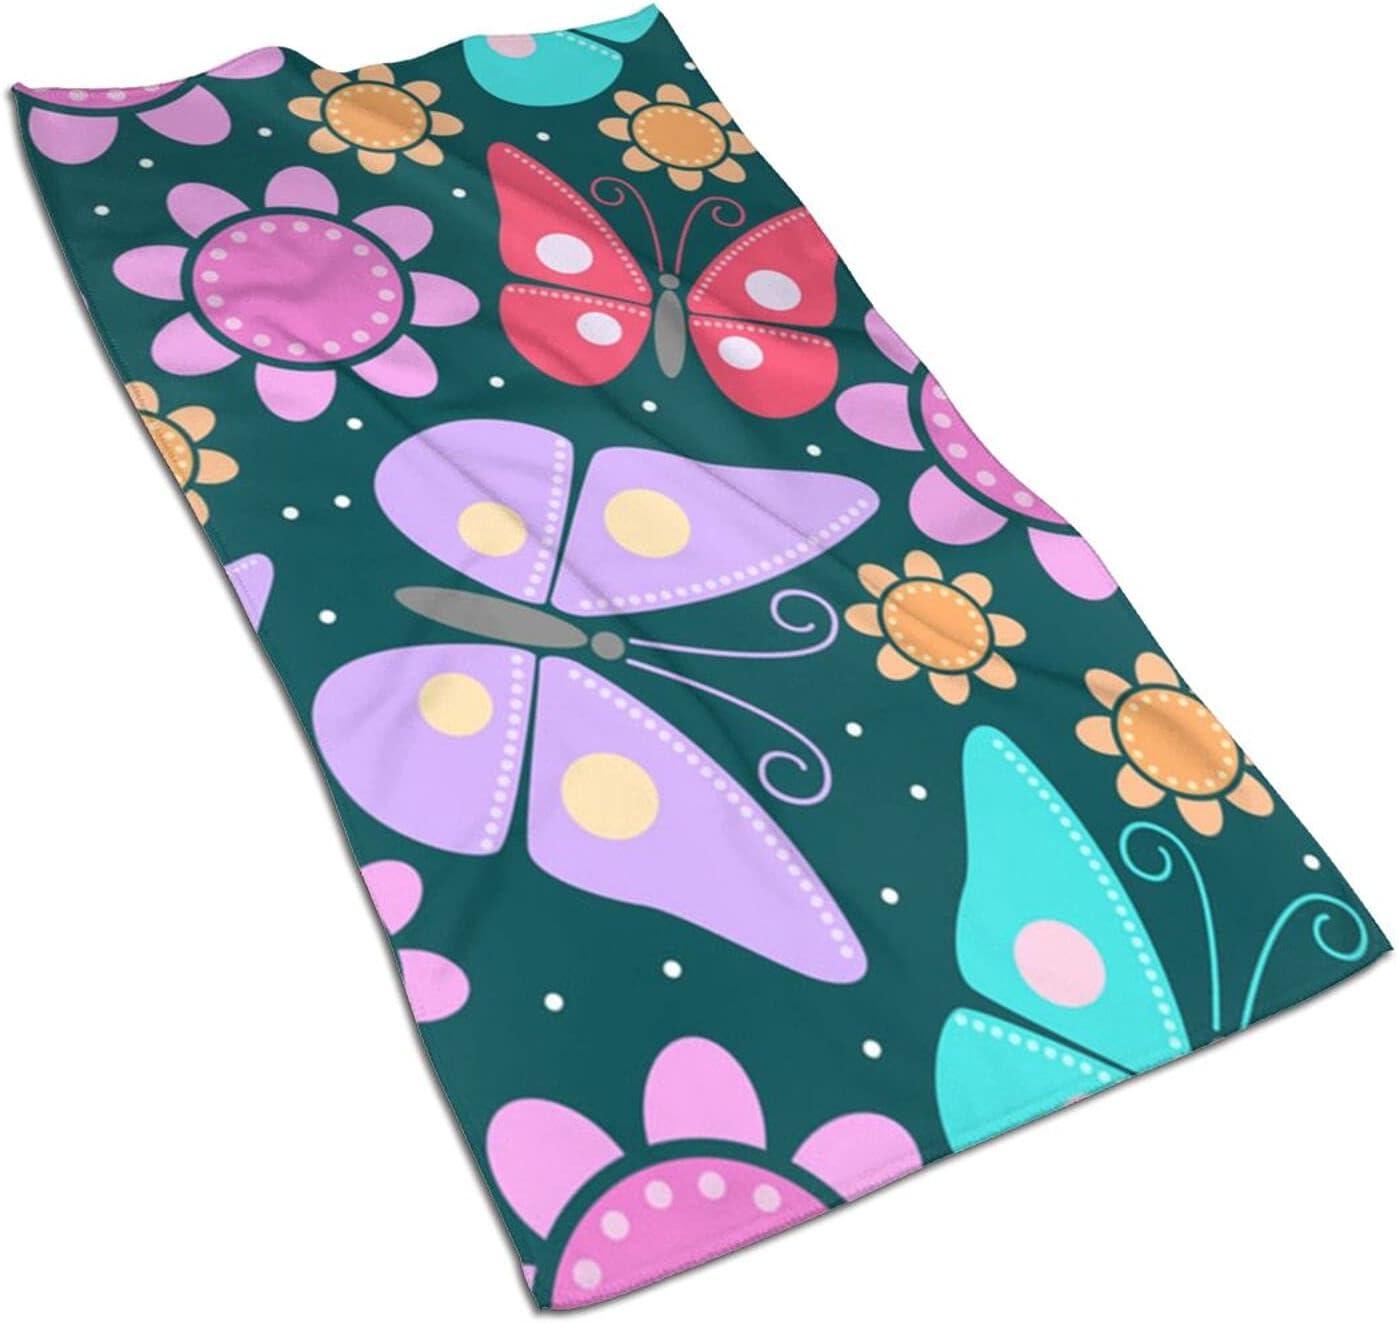 Butterfly Fingertip Towels Quick Face Towel Popular standard Drying Luxury Skin-Friendly